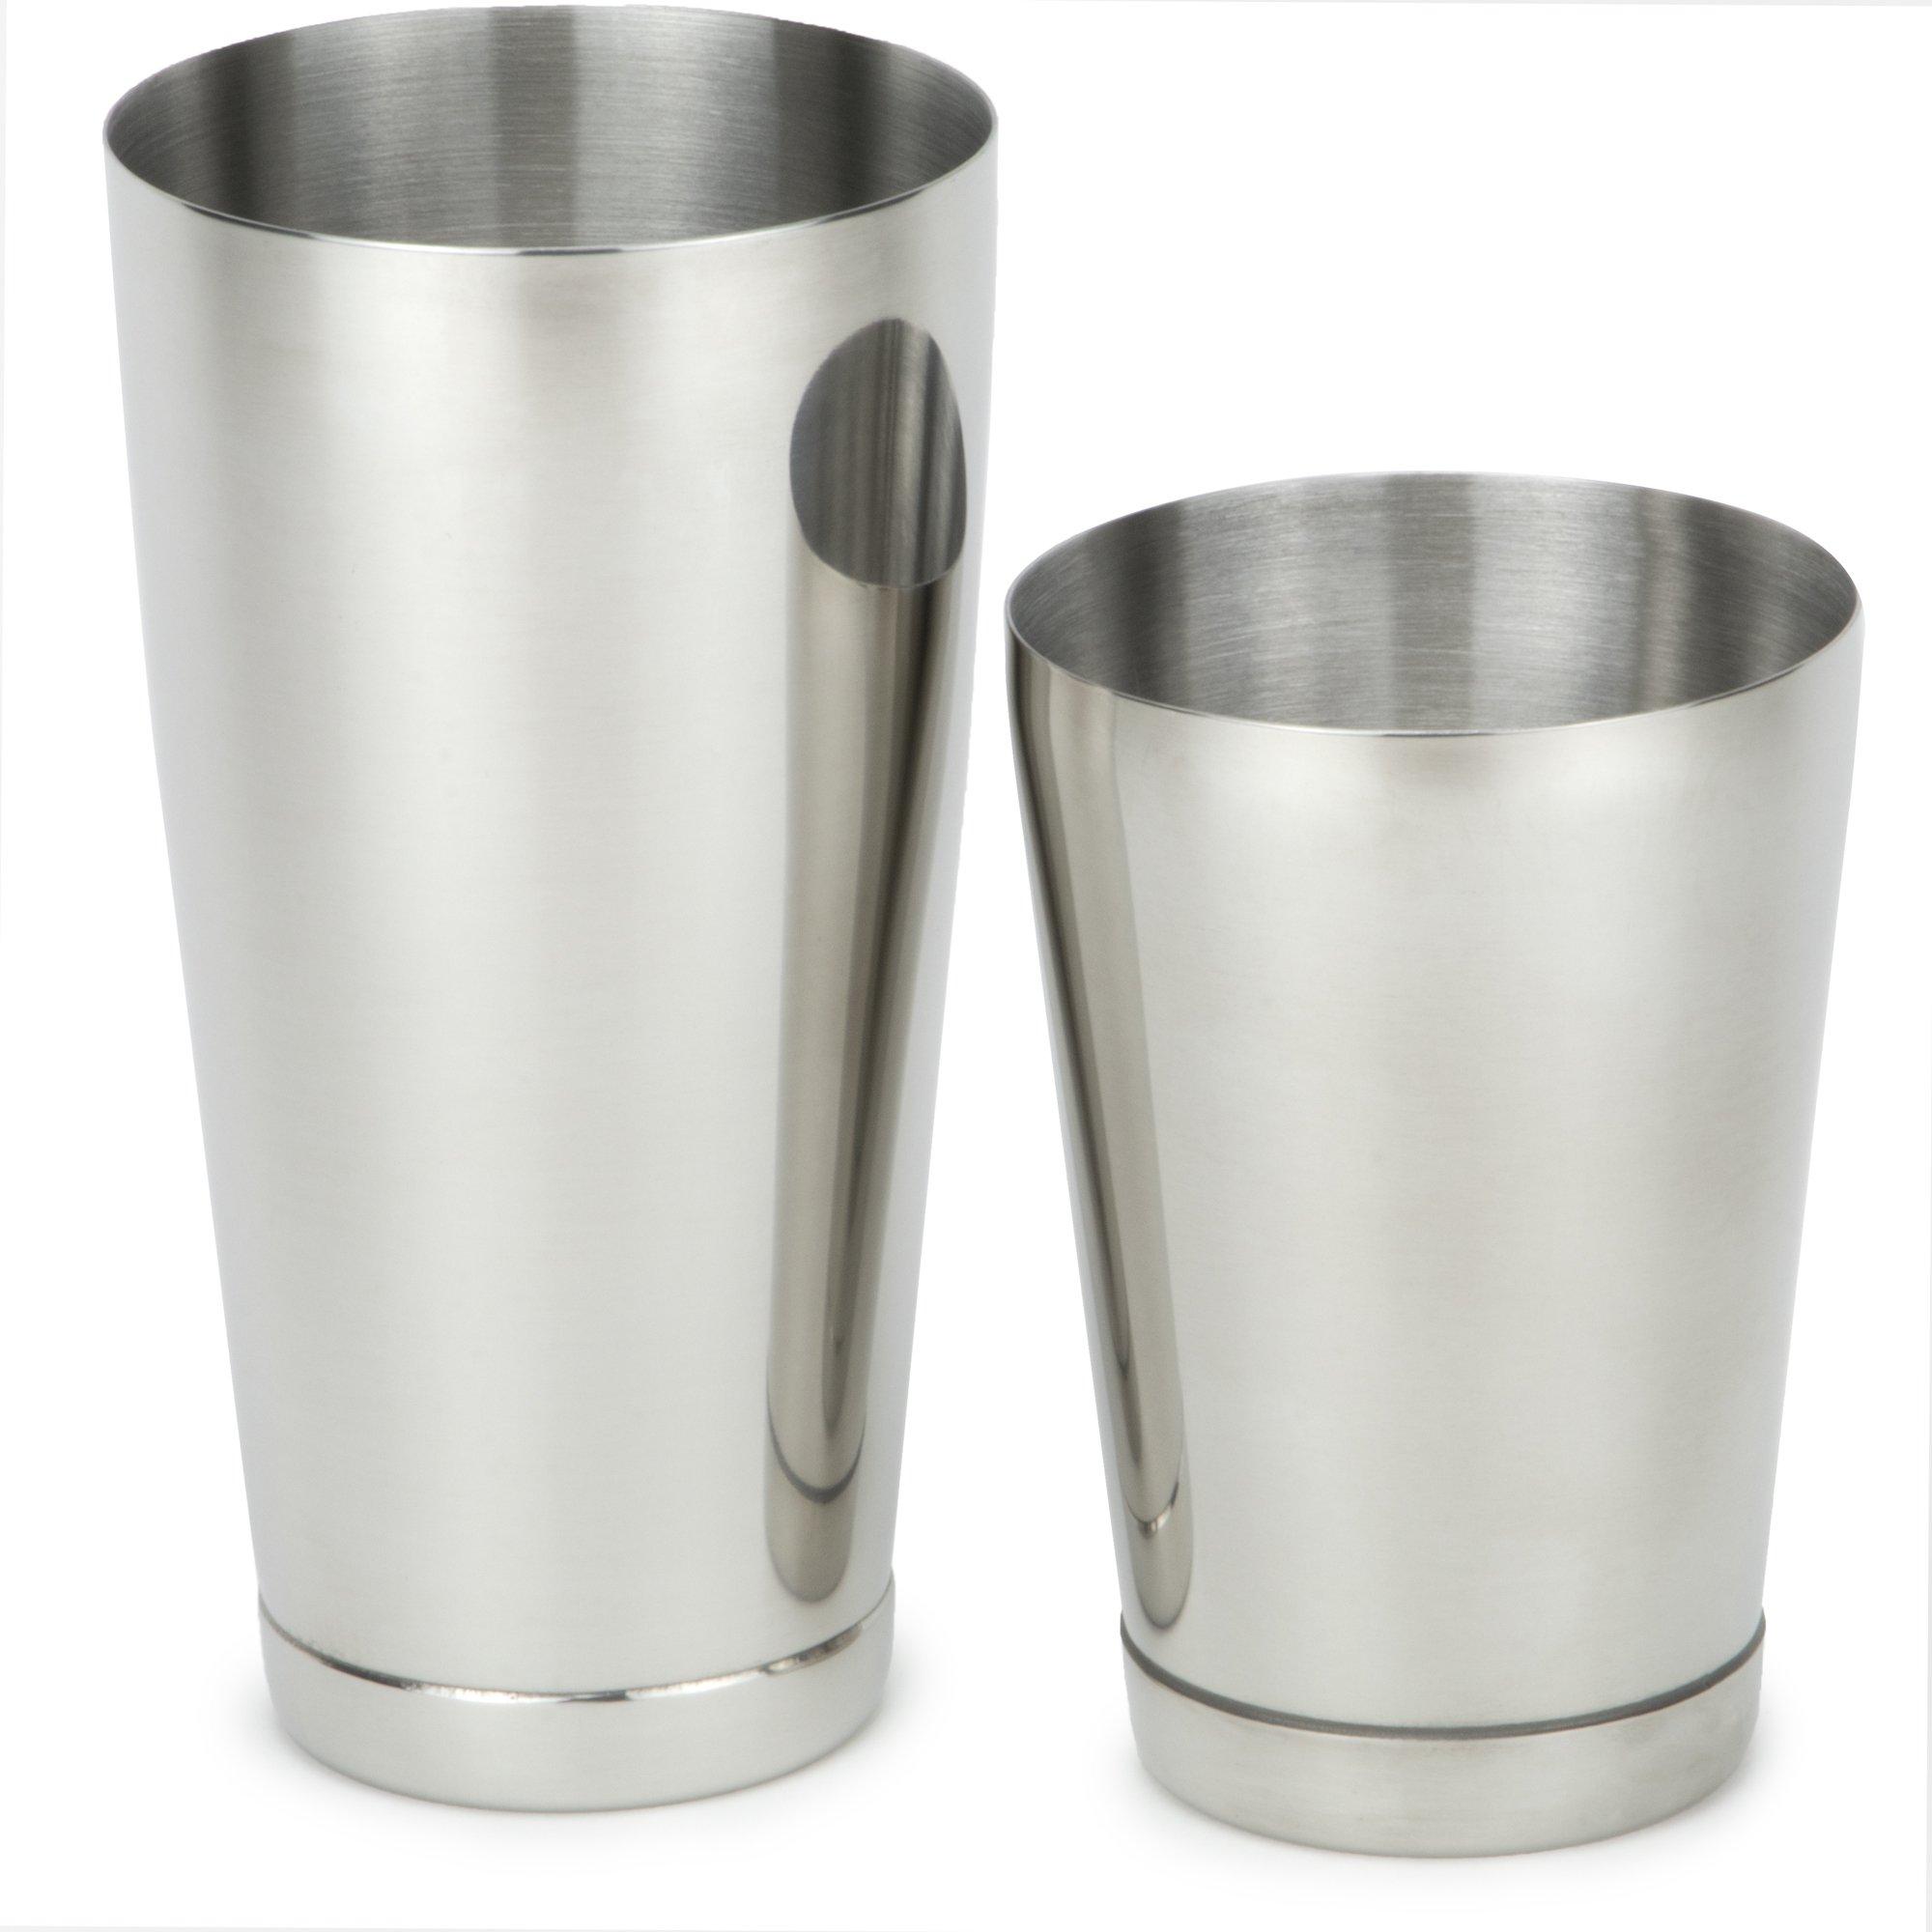 Boston Shakers - Set of 2 Premium Grade Stainless Steel Professional Bartending Shaker Set by Cocktailor